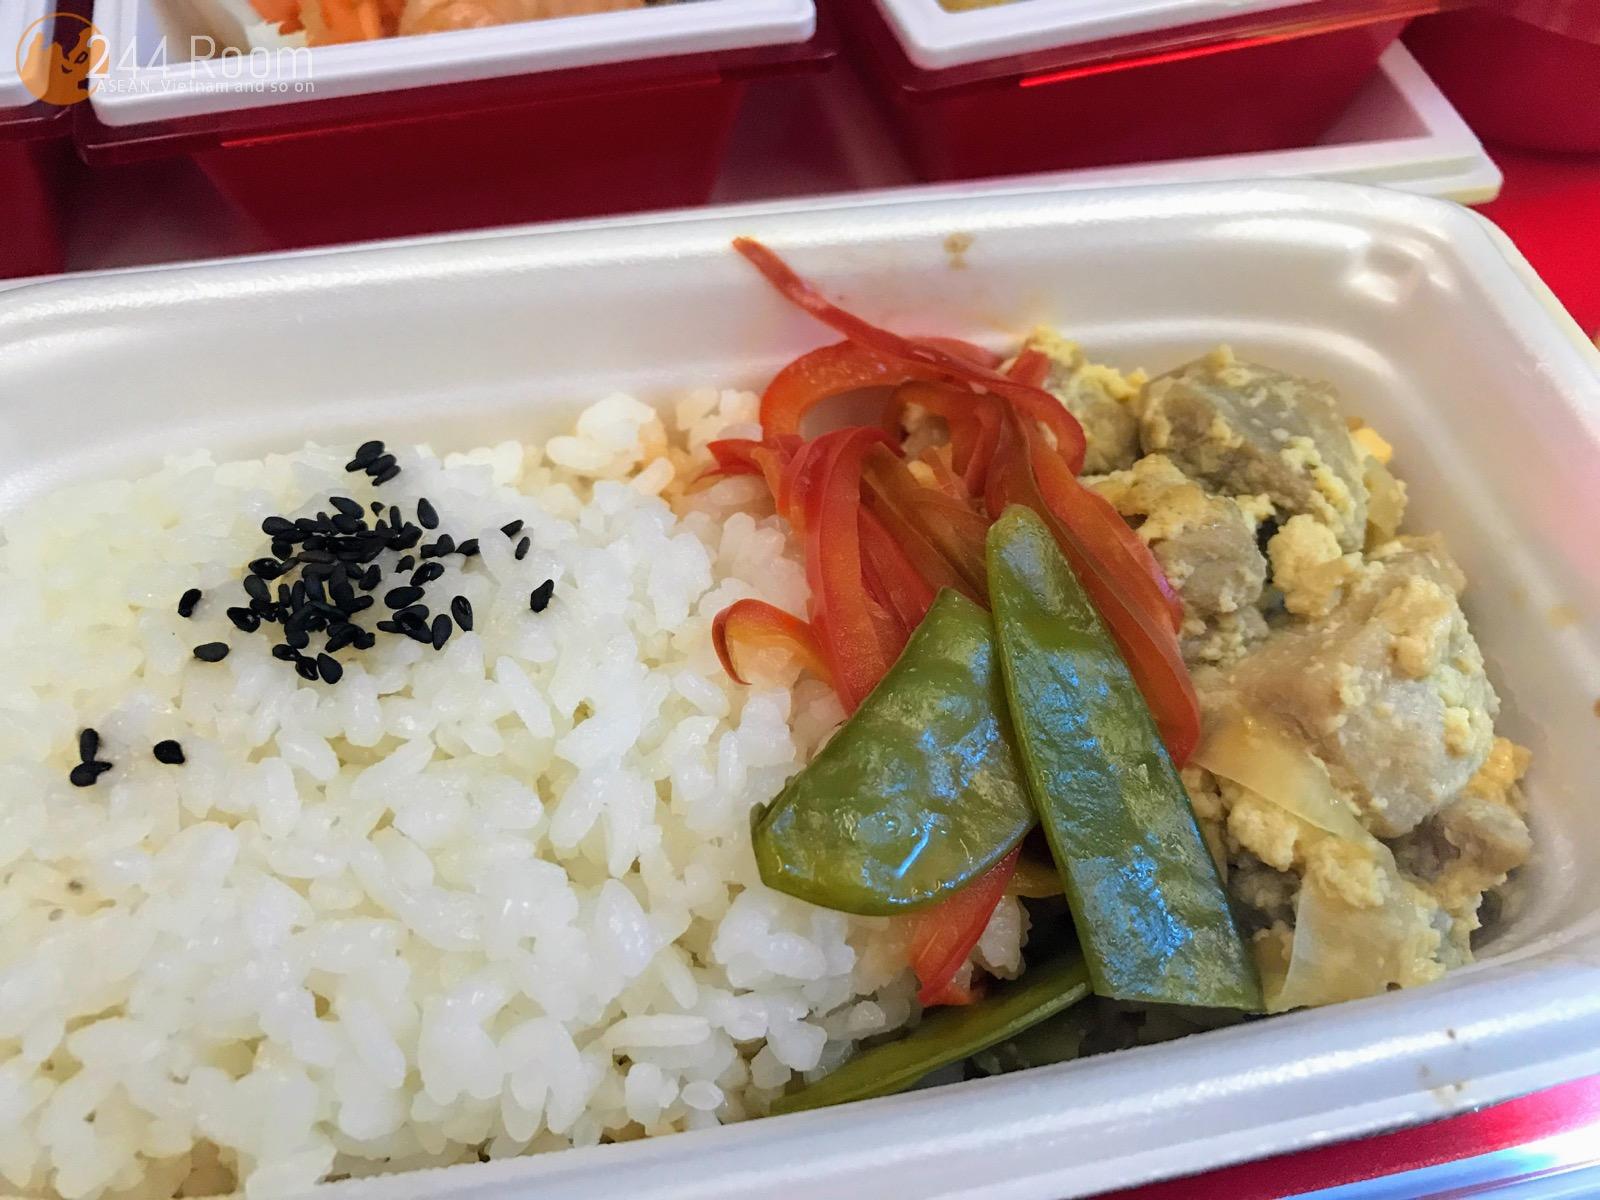 JALエコノミークラス機内食親子丼 JAL Economyclass-flight-meal-japanese